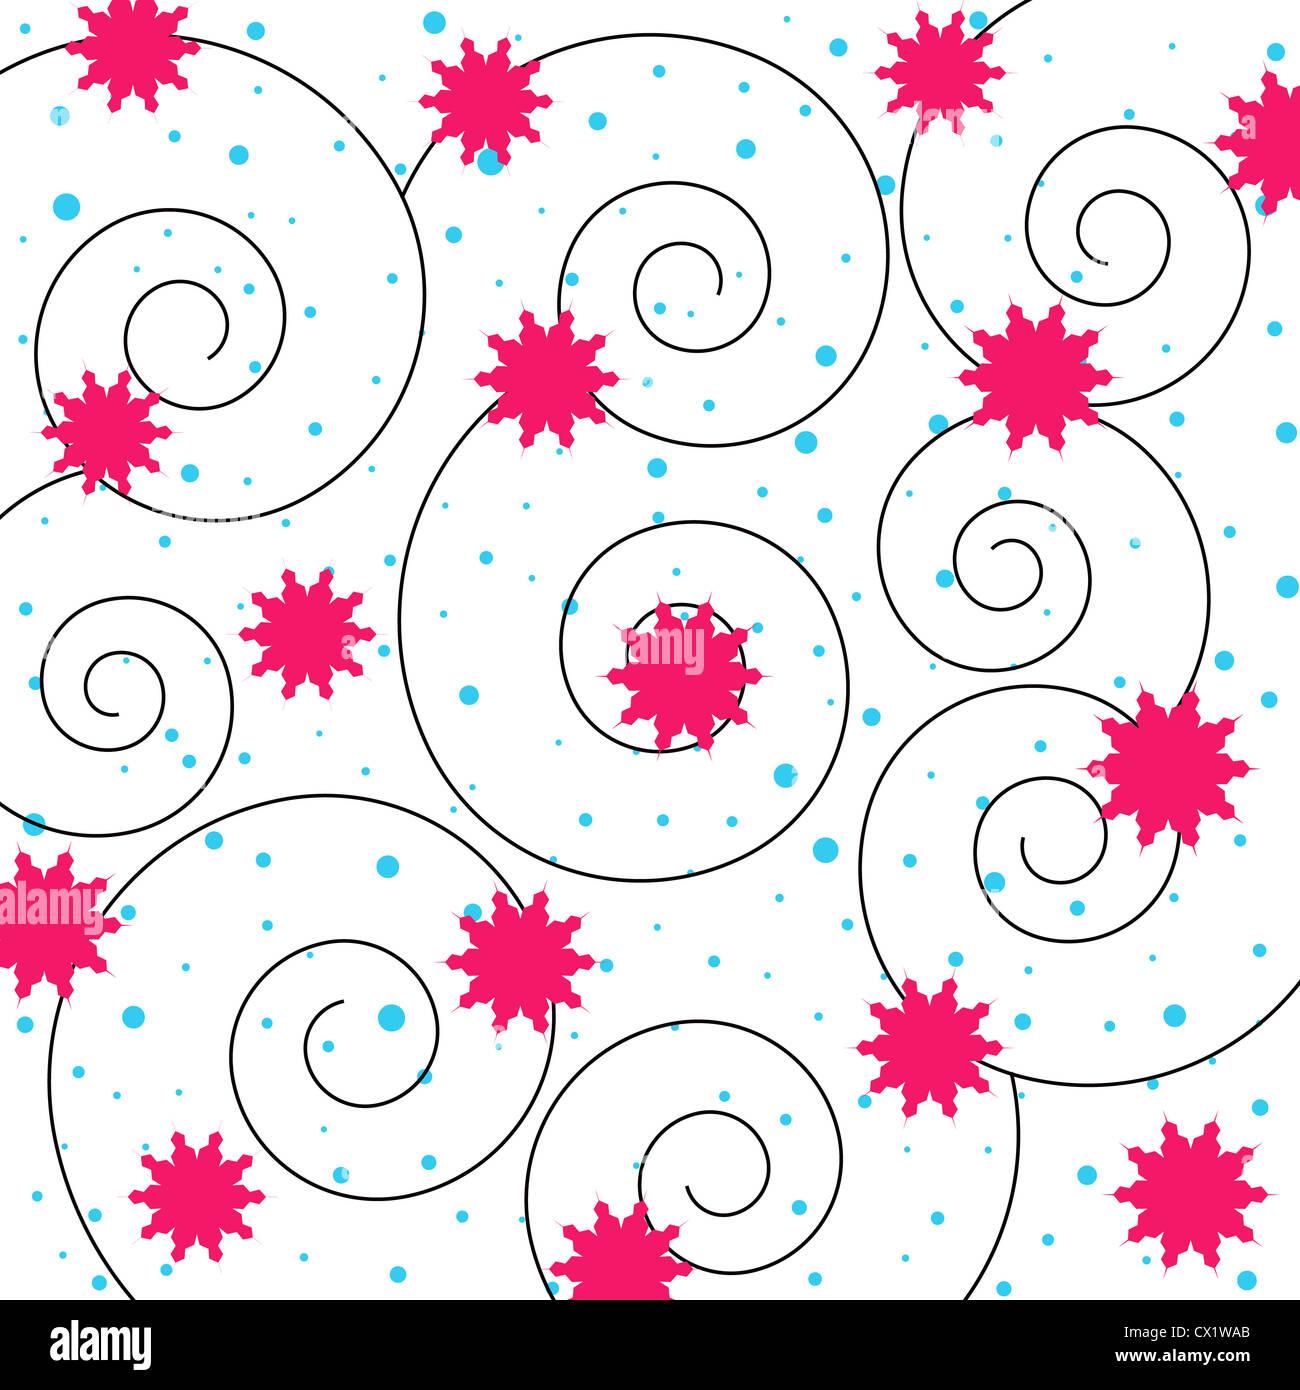 Stars and swirls pattern on white Stock Photo